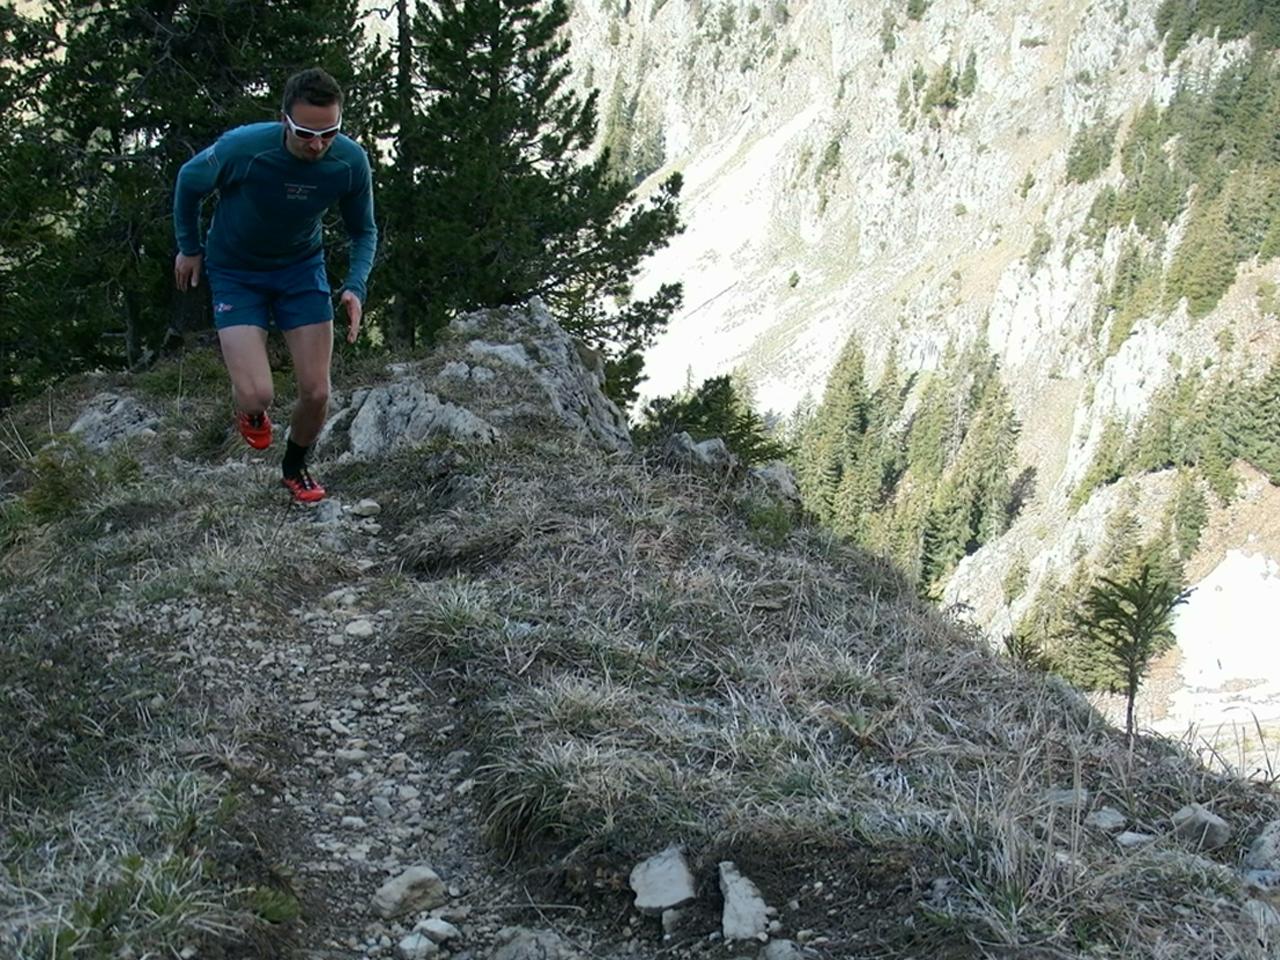 Activiteiten - Trailrunning Thomas Dunkerbeck